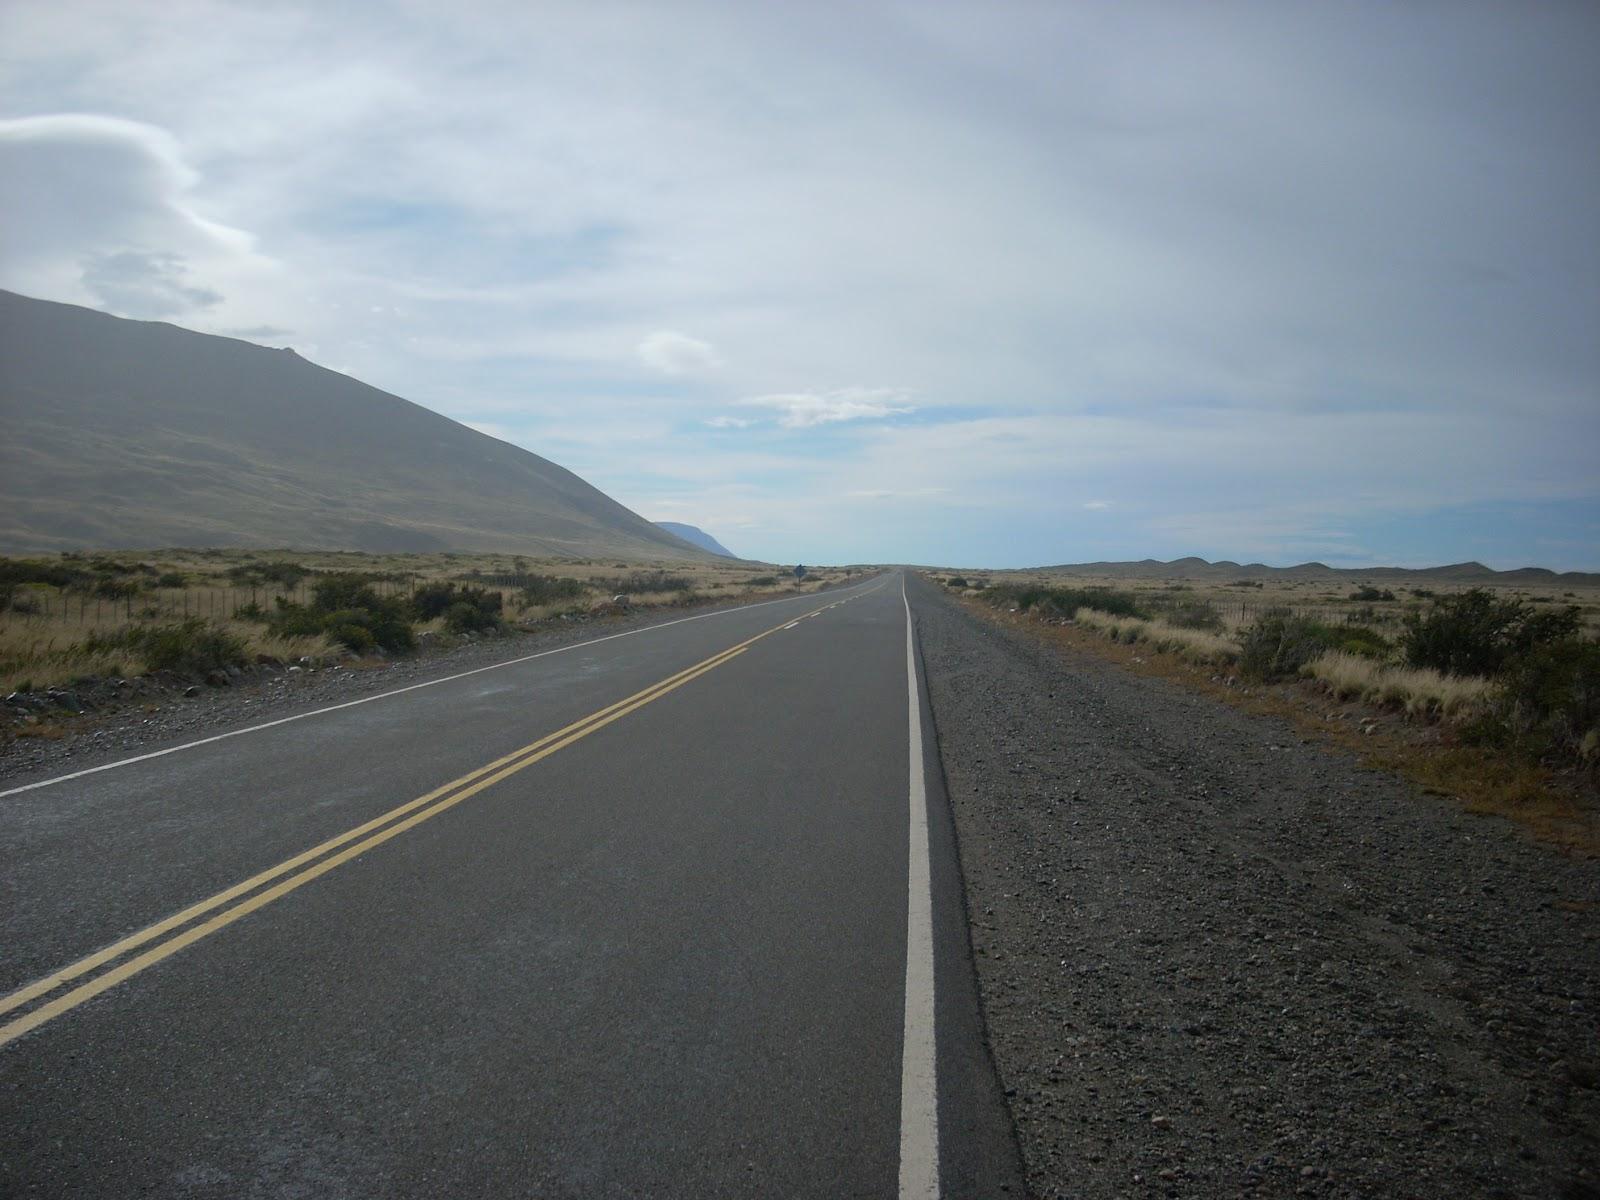 Smooth straight roads ahead